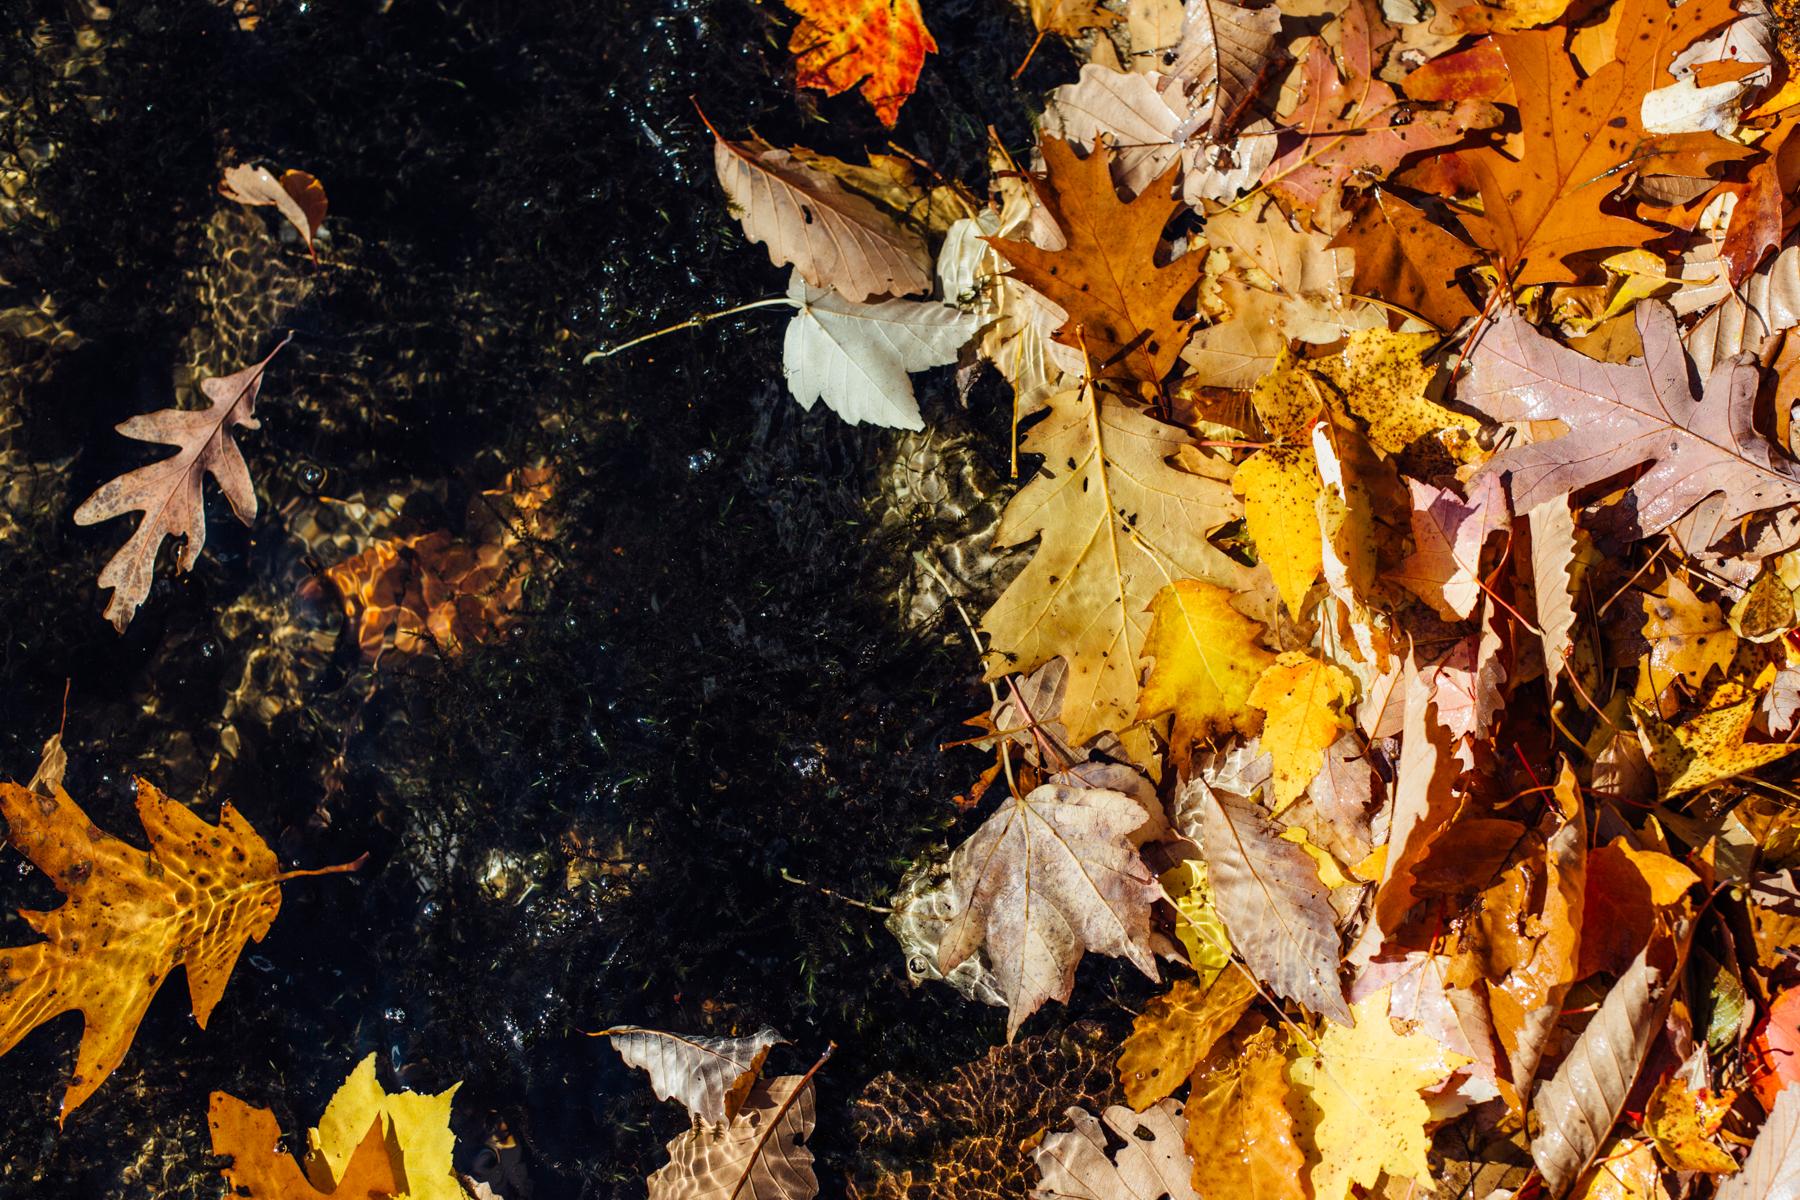 harriman-state-park-fall-9177.jpg